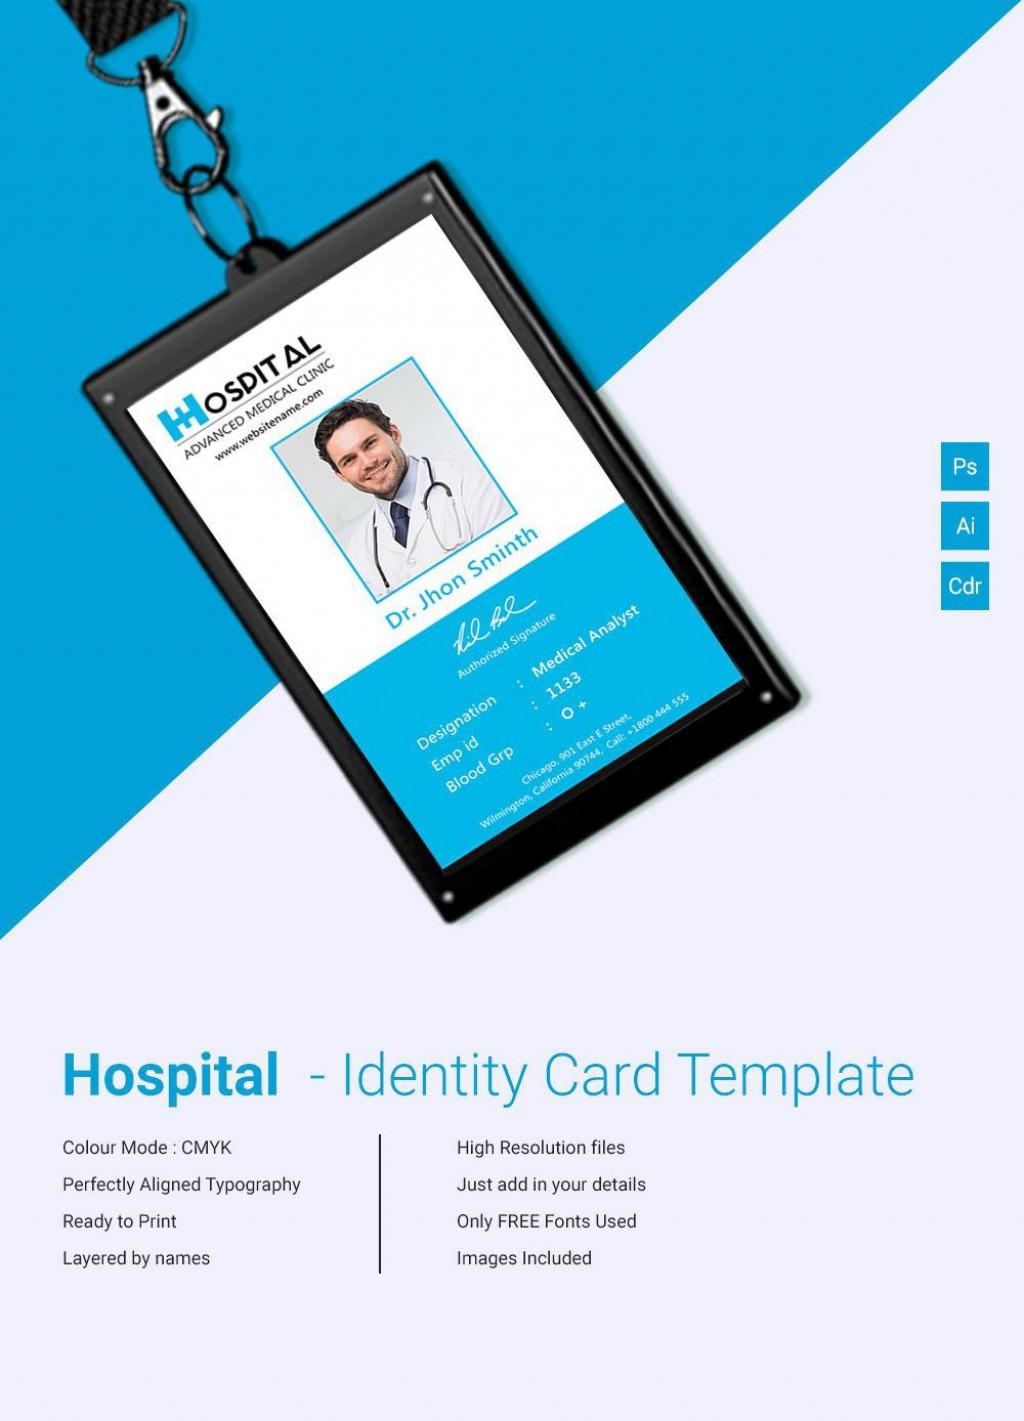 002 Best Id Card Template Free Sample  Download Pdf DesignLarge